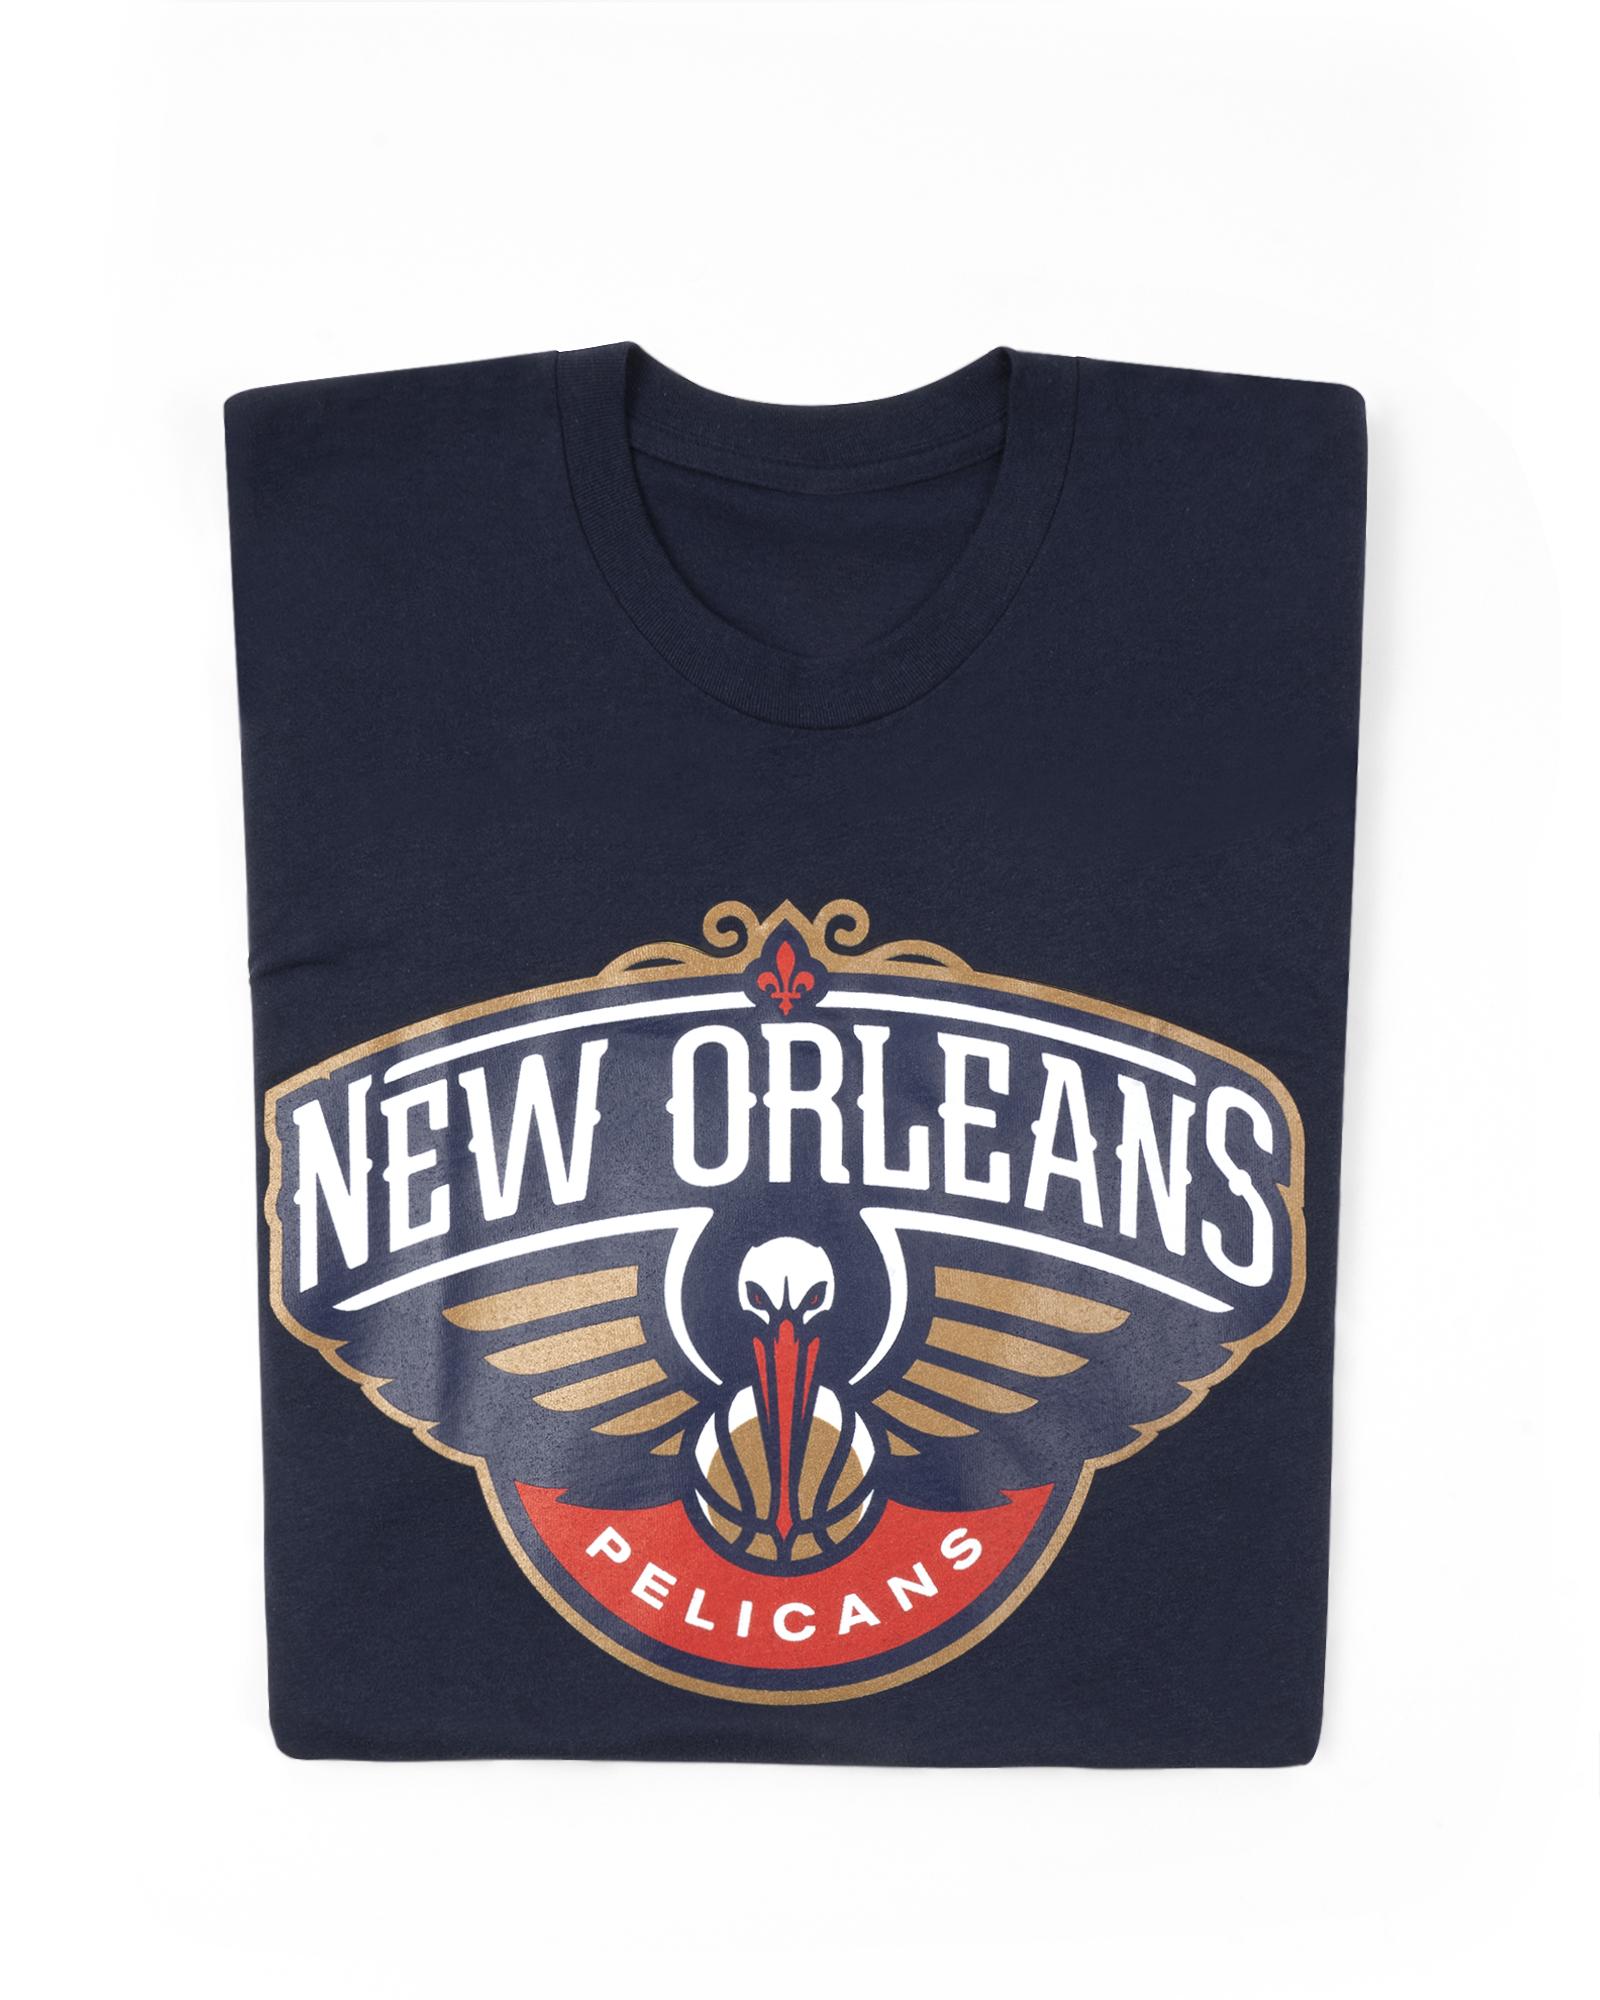 Navy blue sports t-shirt